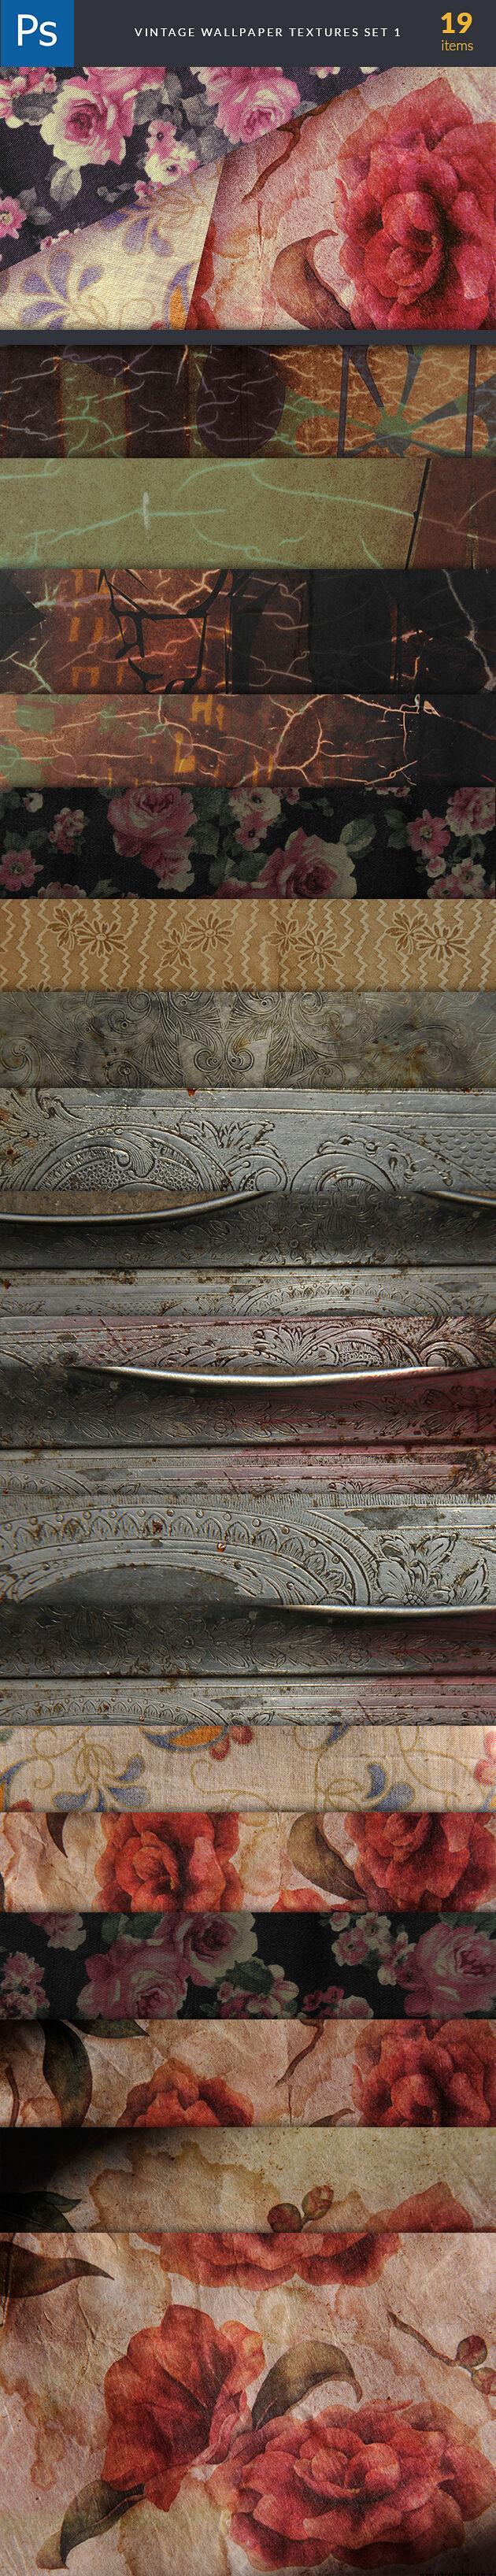 designtnt-textures-vintage-wallpapers-set-preview-large